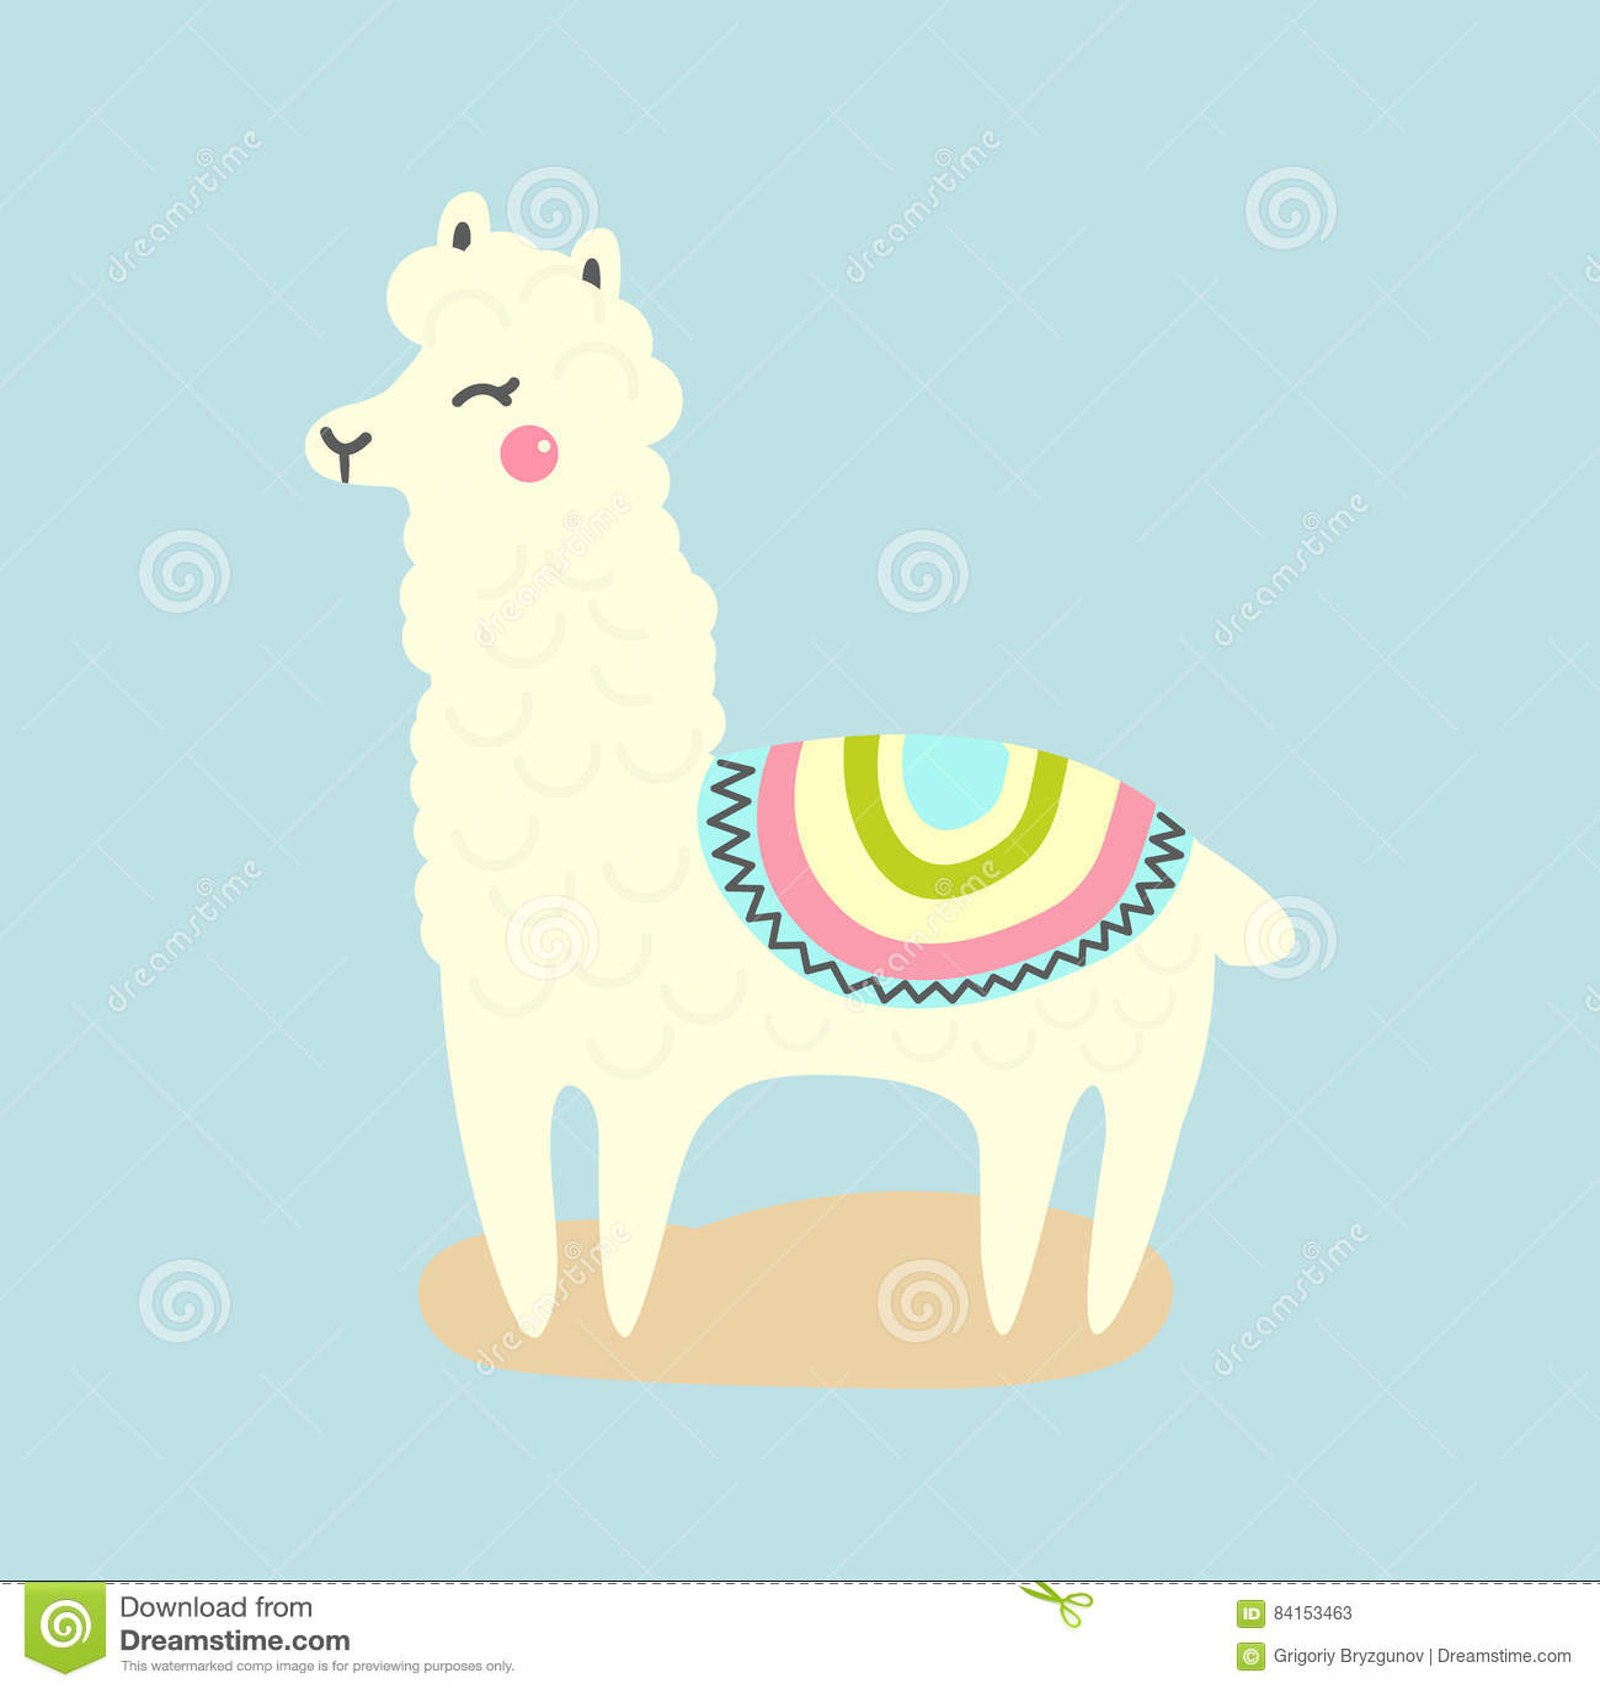 Vector Cute Llama Or Alpaca Illustration. Funny Animal ...